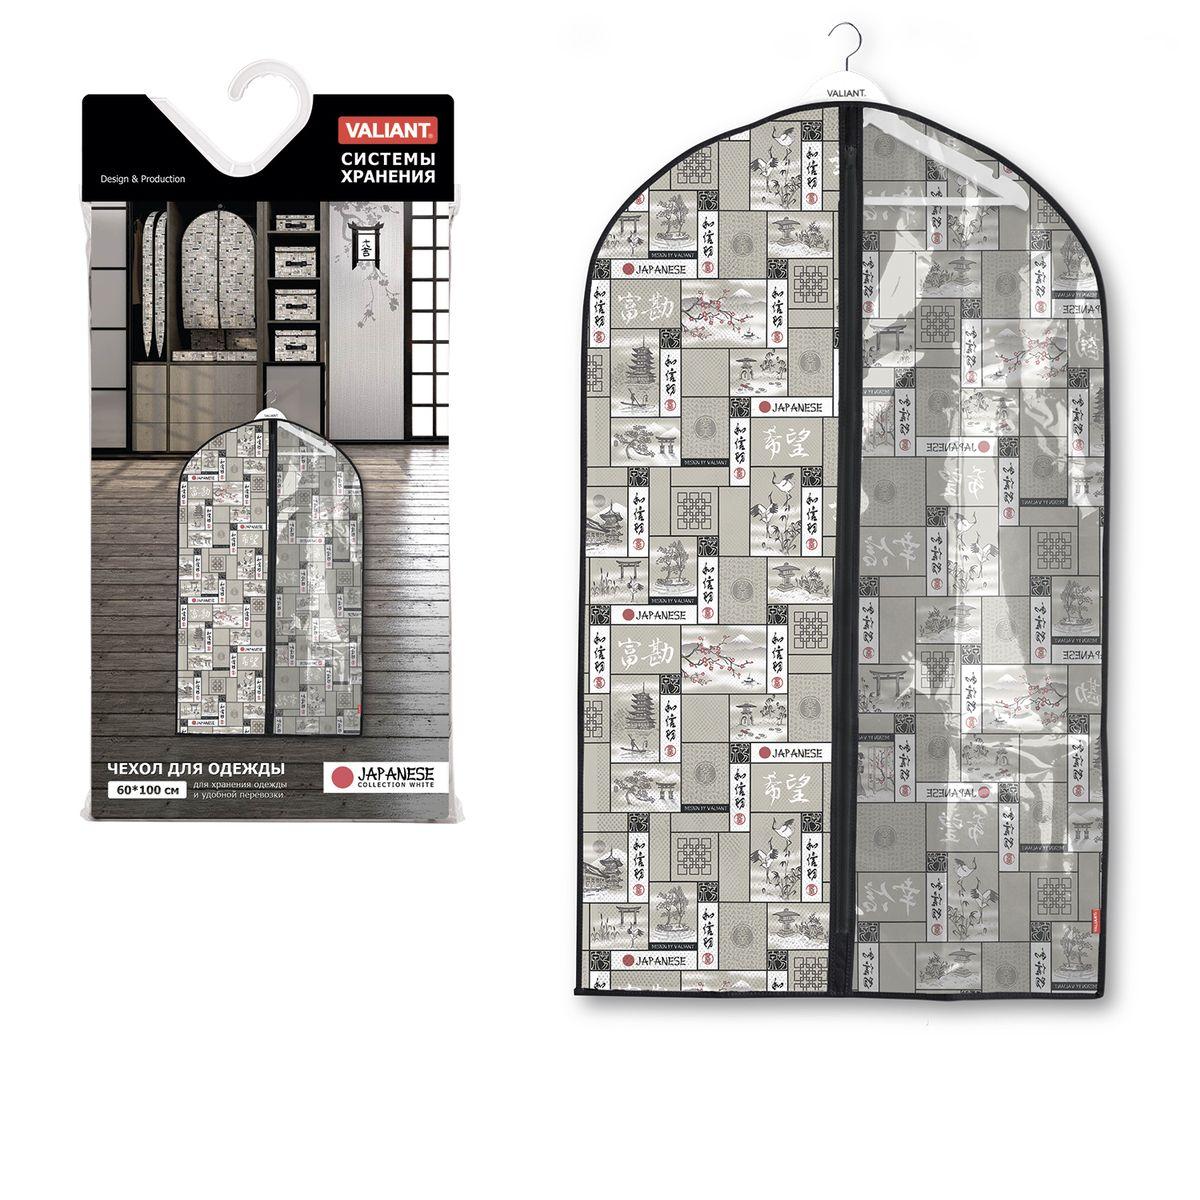 Чехол для одежды Valiant Japanese White, с прозрачной вставкой, 60 х 100 х 10 см чехол для одежды el casa звезды подвесной с прозрачной вставкой цвет сиреневый 112 5 х 57 х 17 см